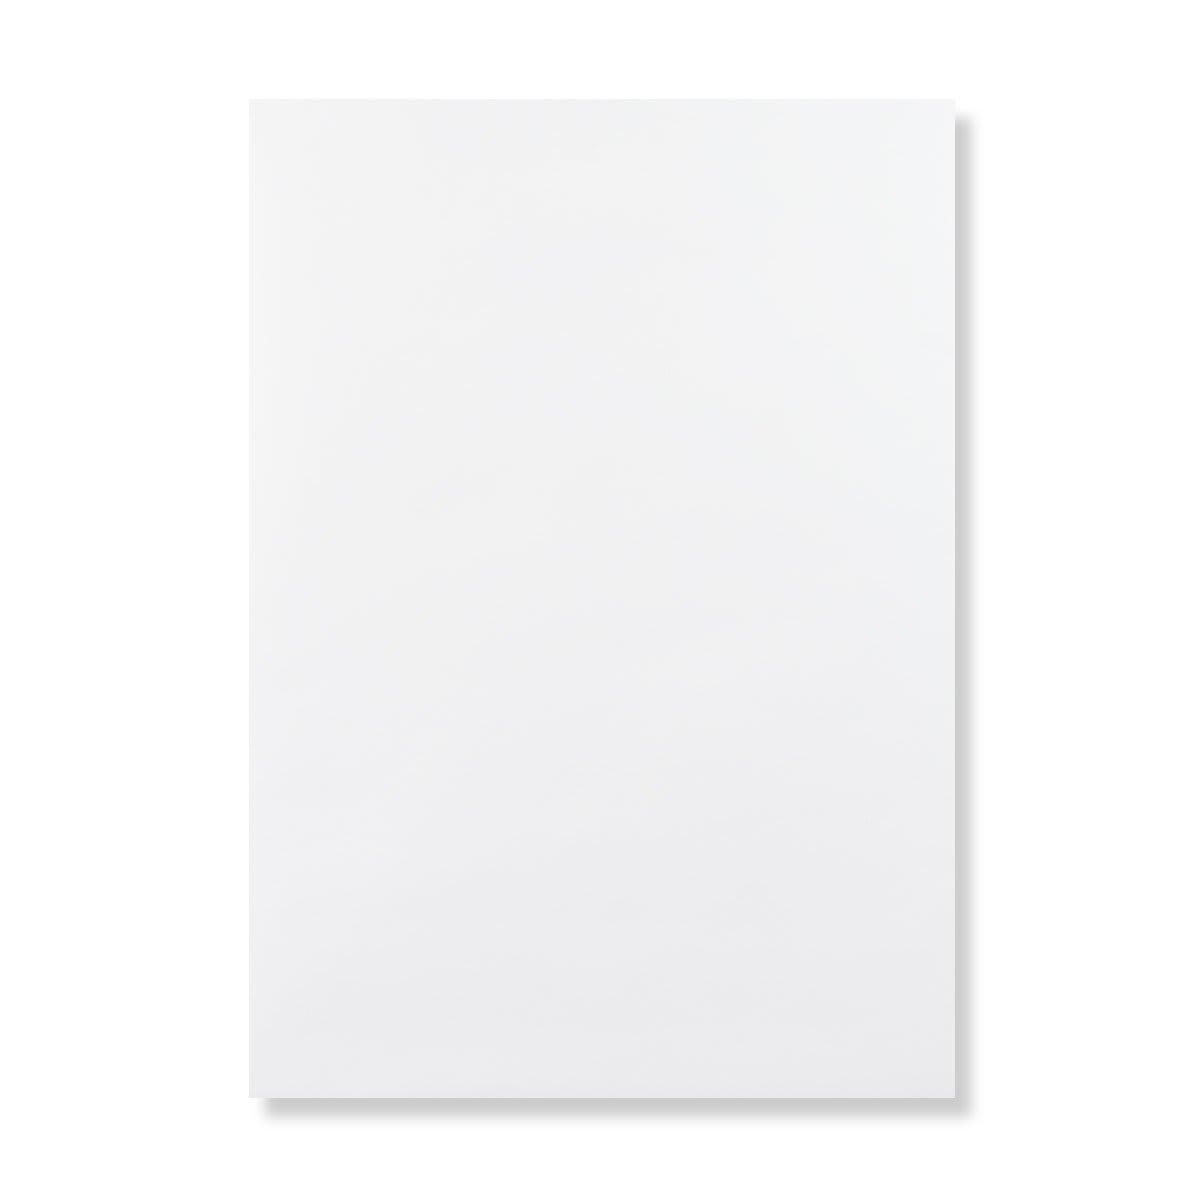 C4 WHITE STRING & WASHER ENVELOPES 180GSM